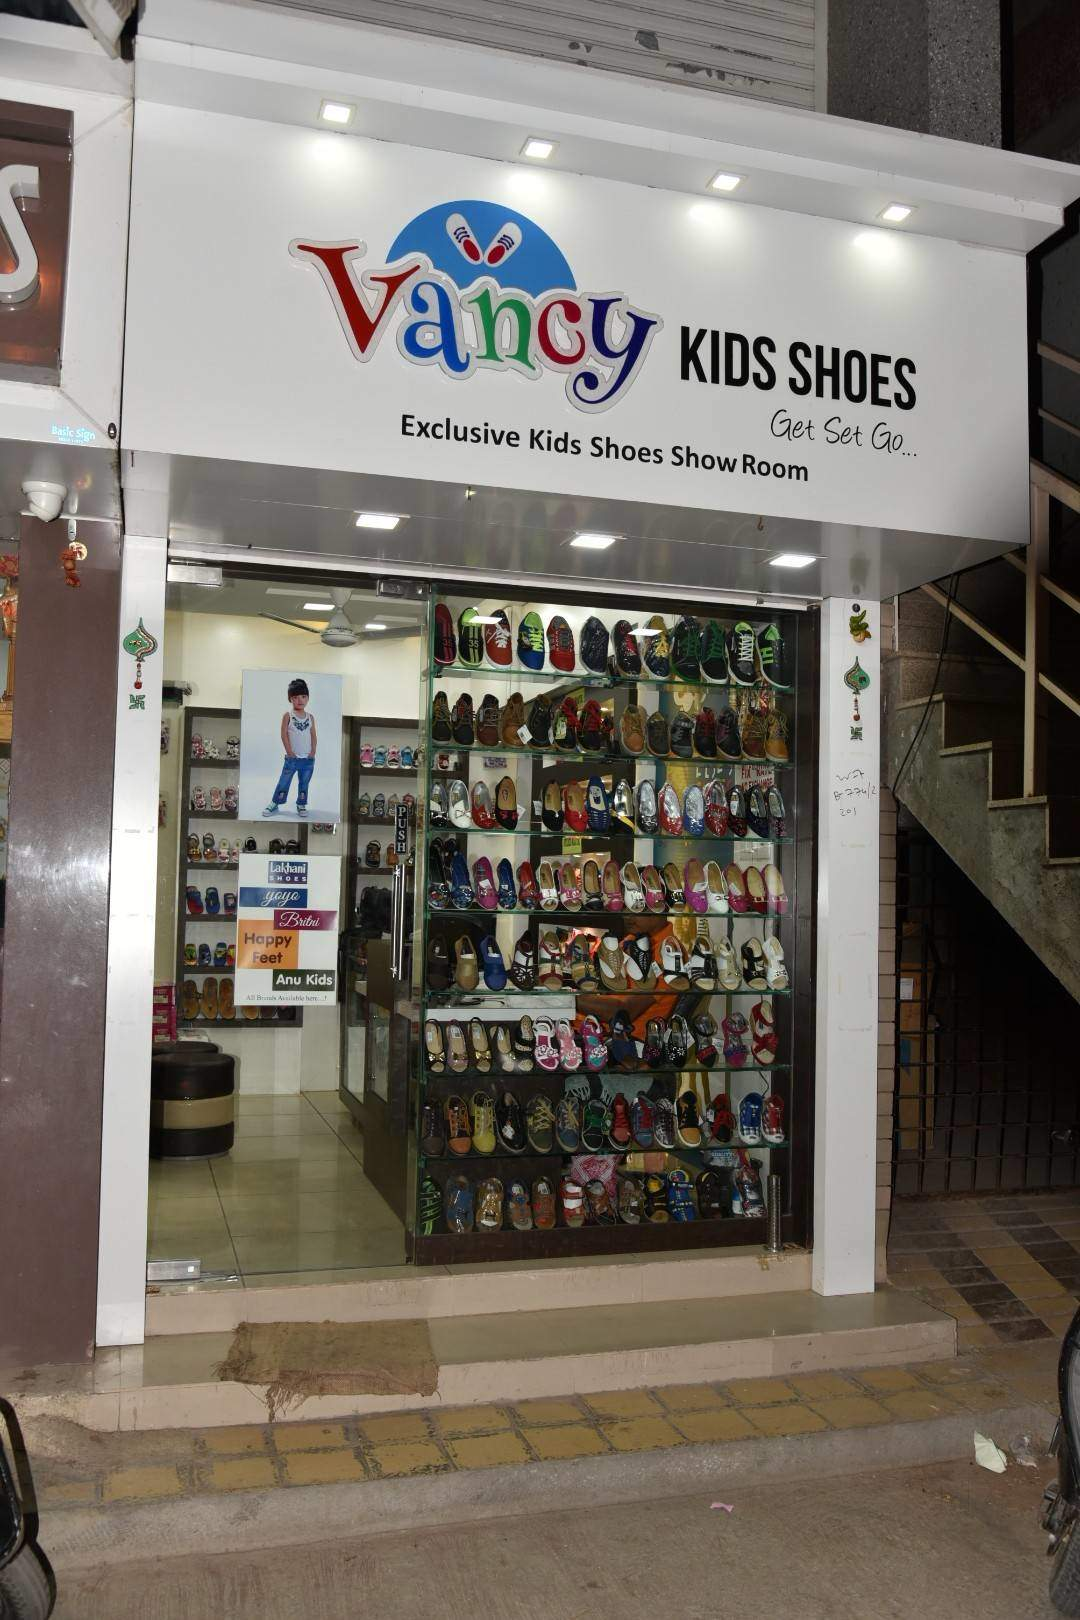 Vancy Kids Shoes, Yagnik Road - Shoe